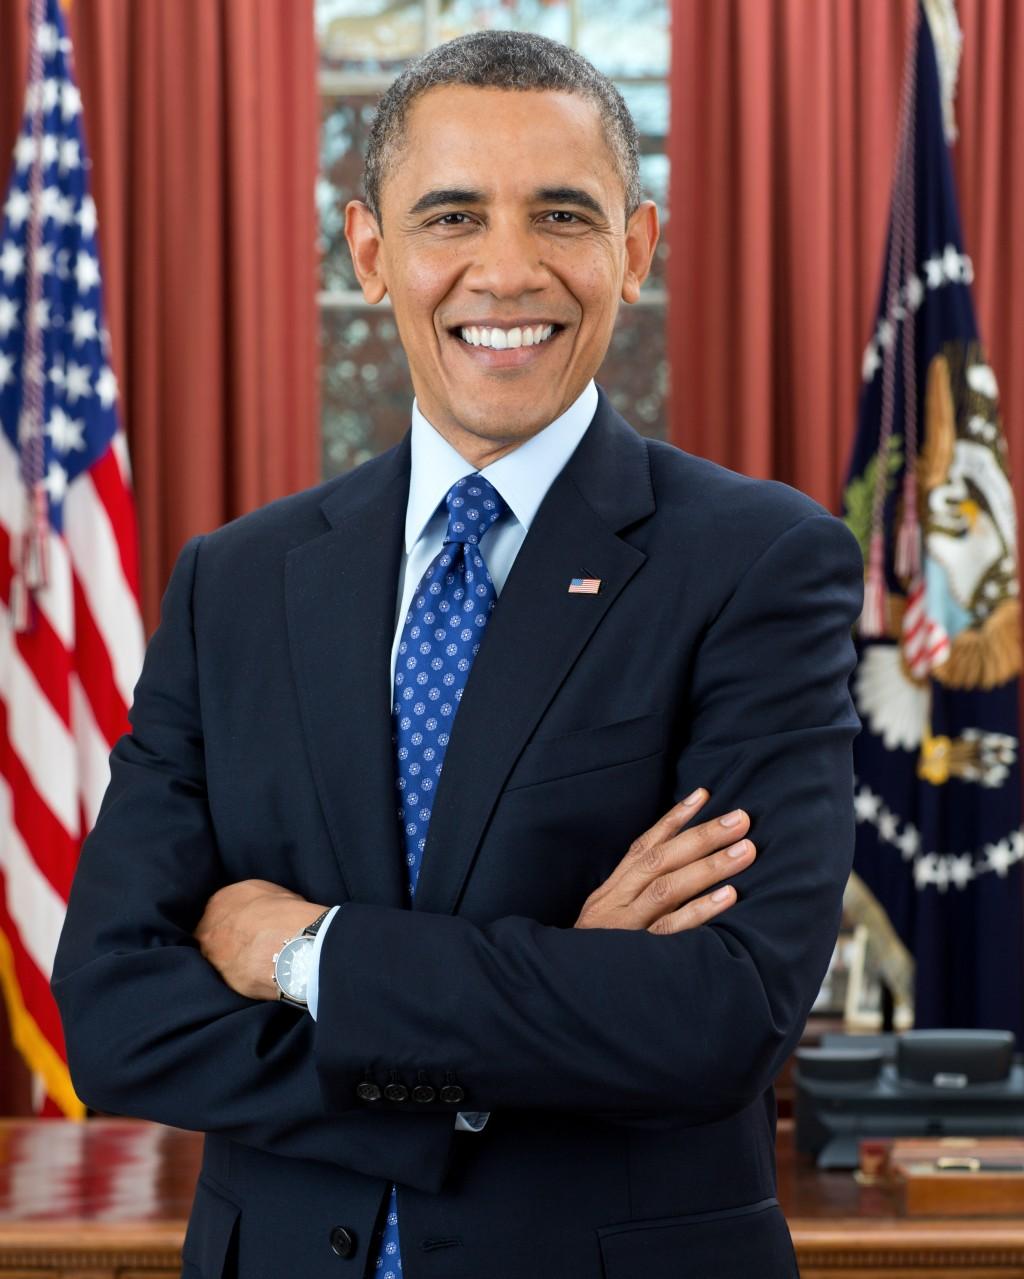 Barack obama short